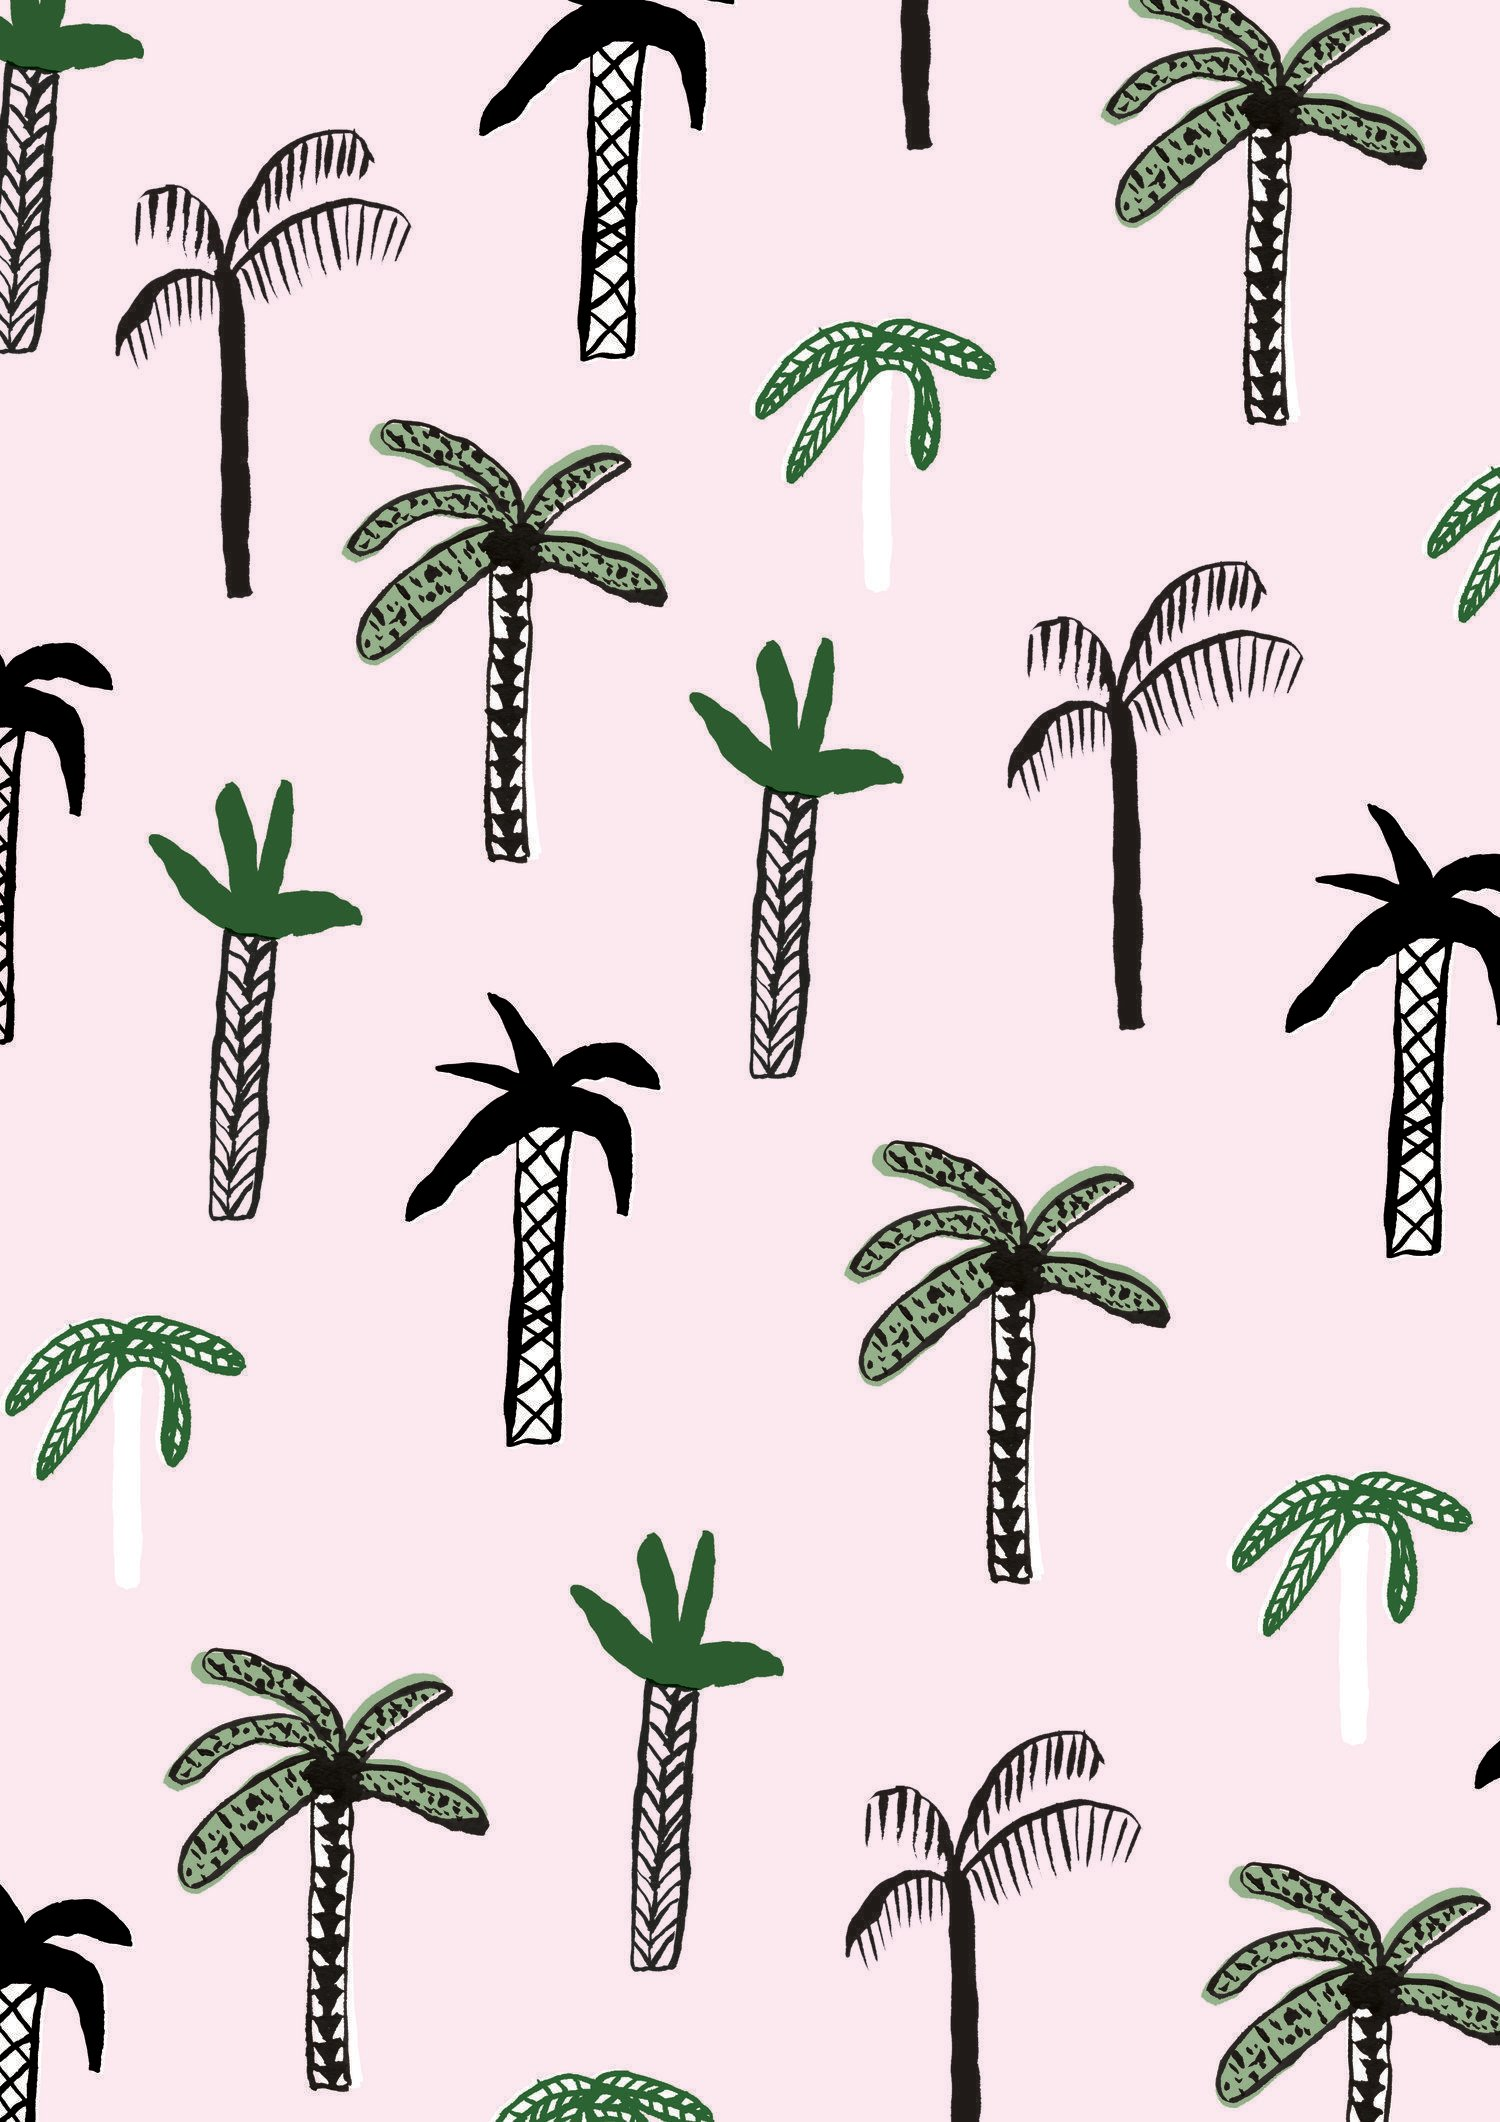 Cartoon Palm Tree Wallpapers Top Free Cartoon Palm Tree Backgrounds Wallpaperaccess